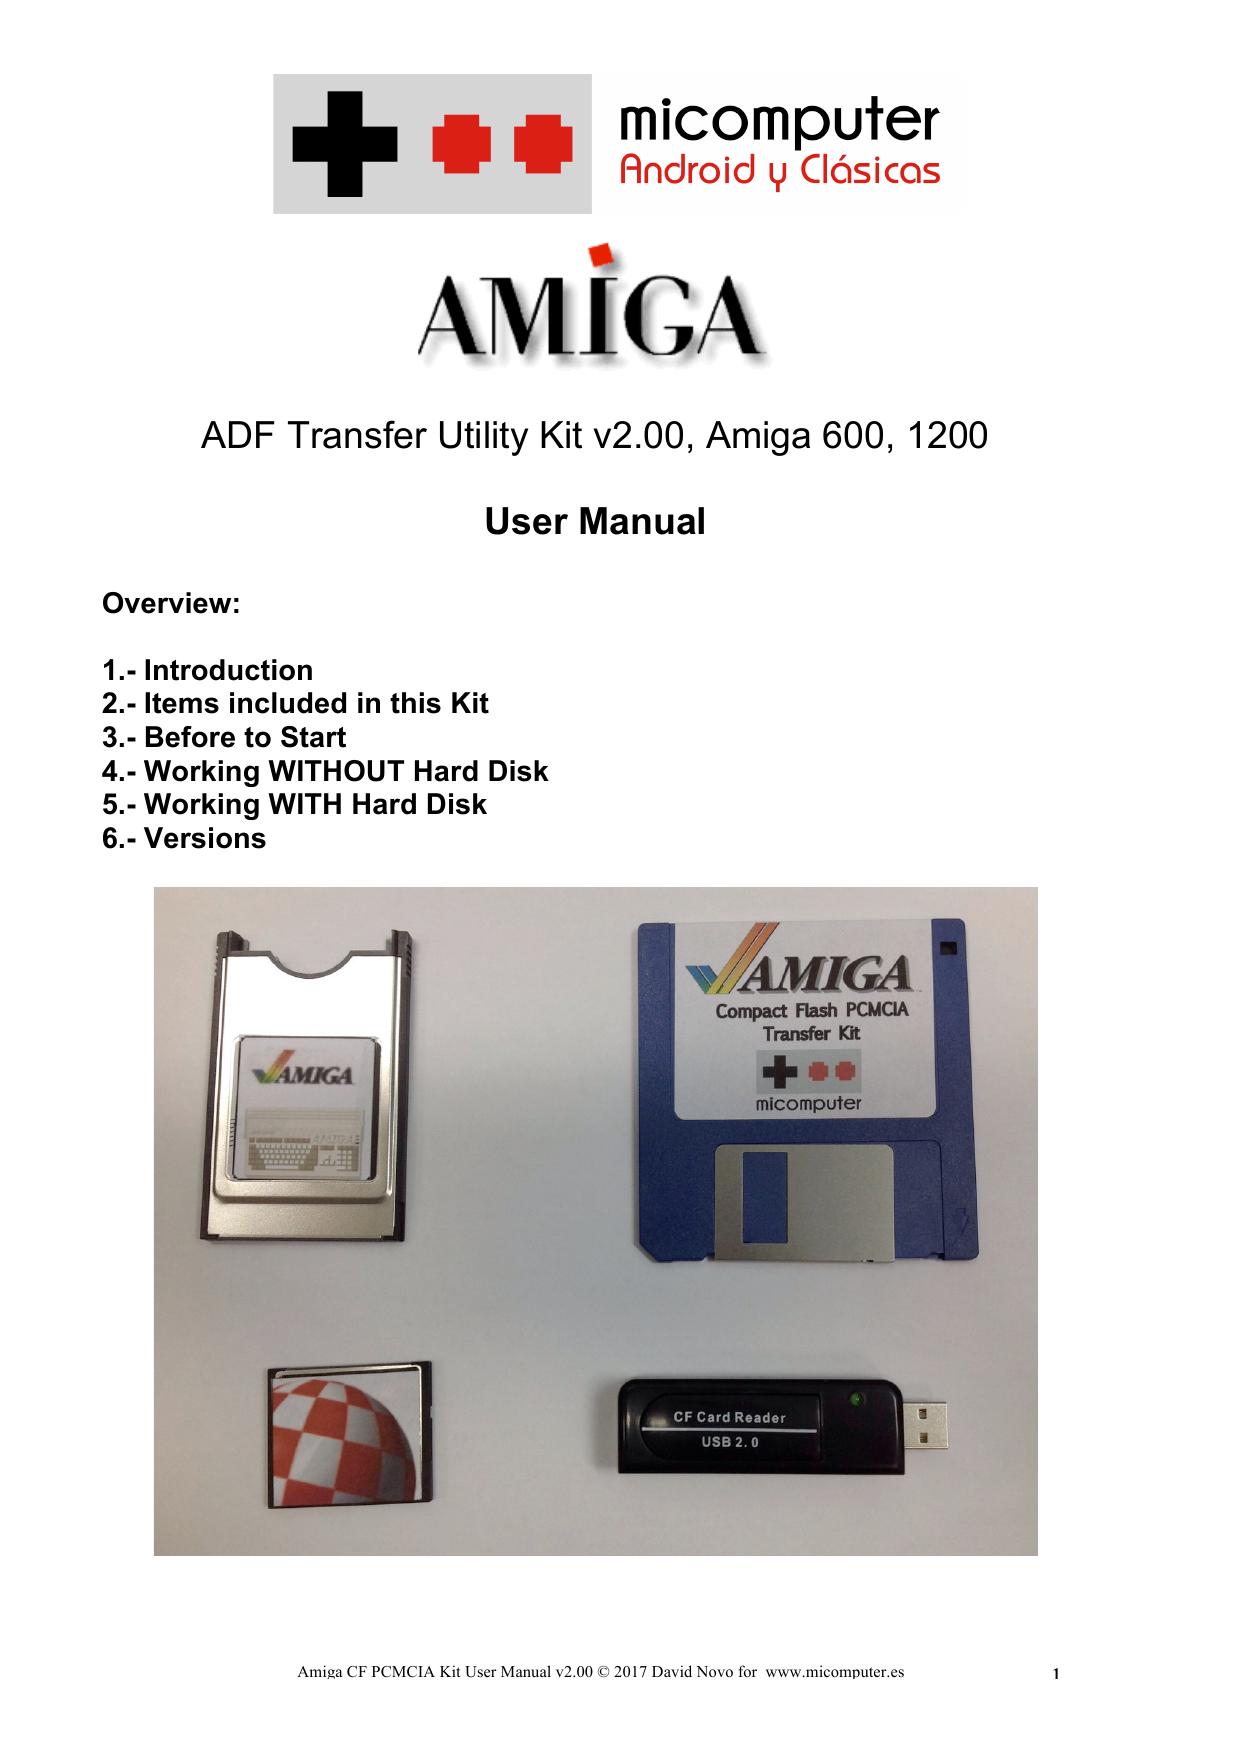 ADF Transfer Utility Kit v2 00, Amiga 600, 1200 User